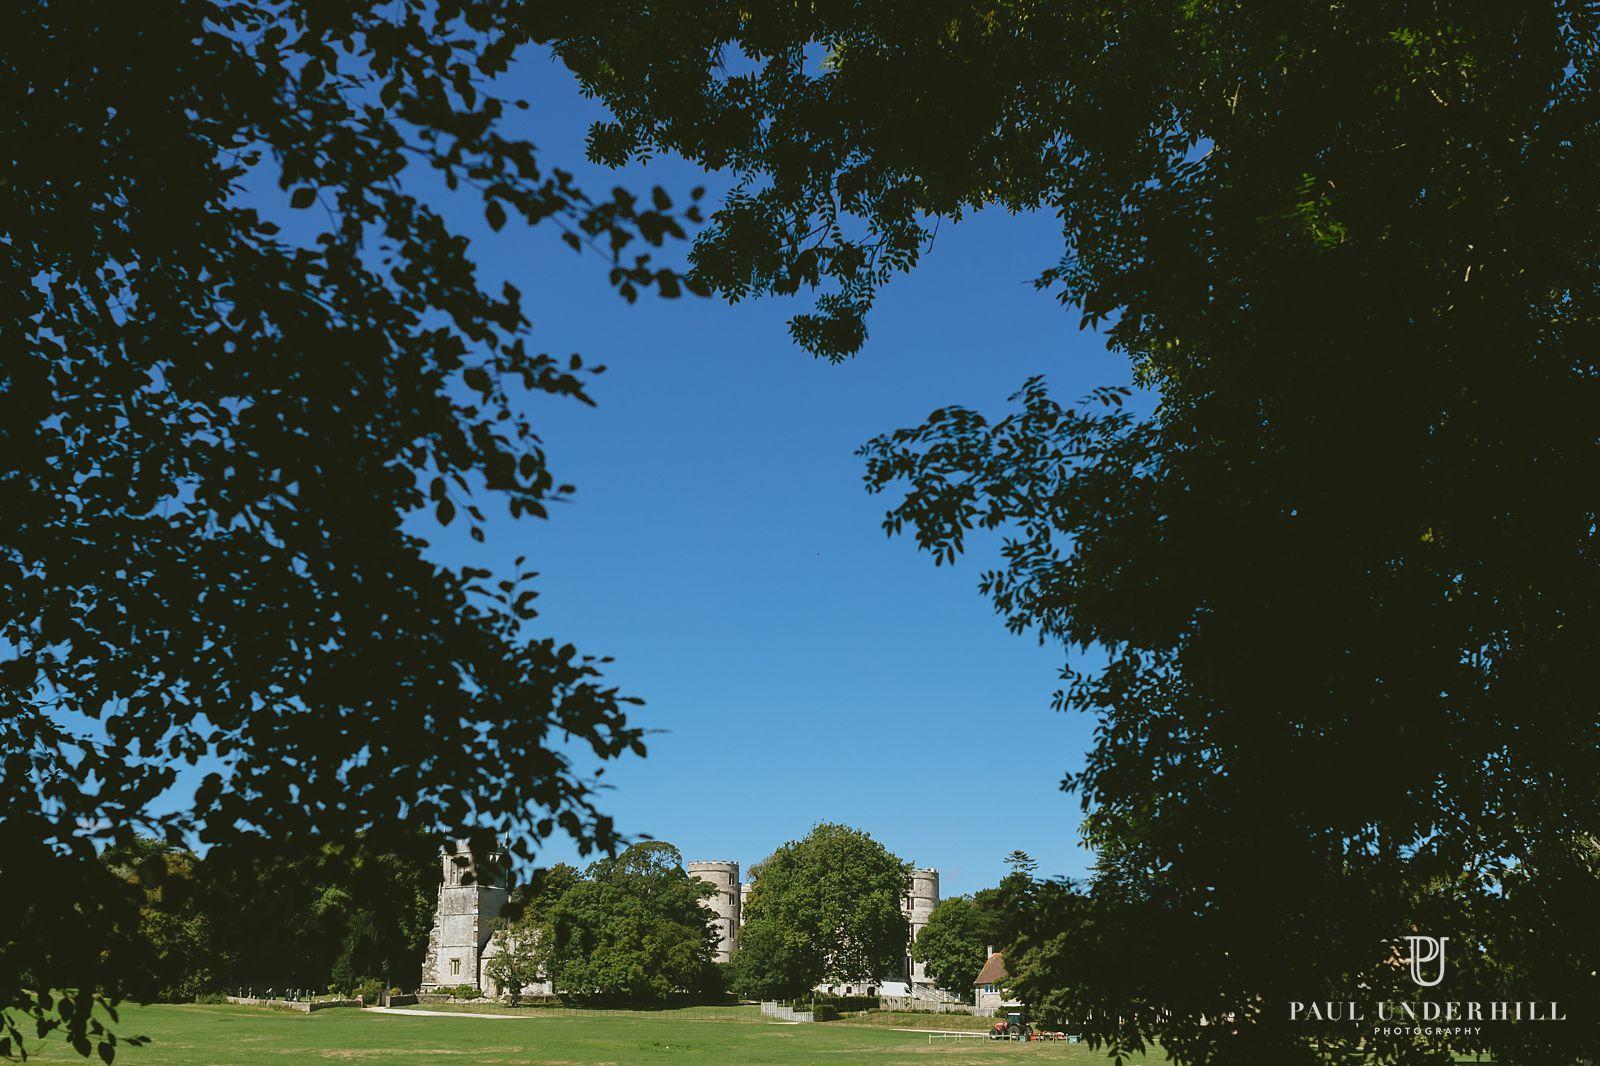 lulworth-castle-in-dorset